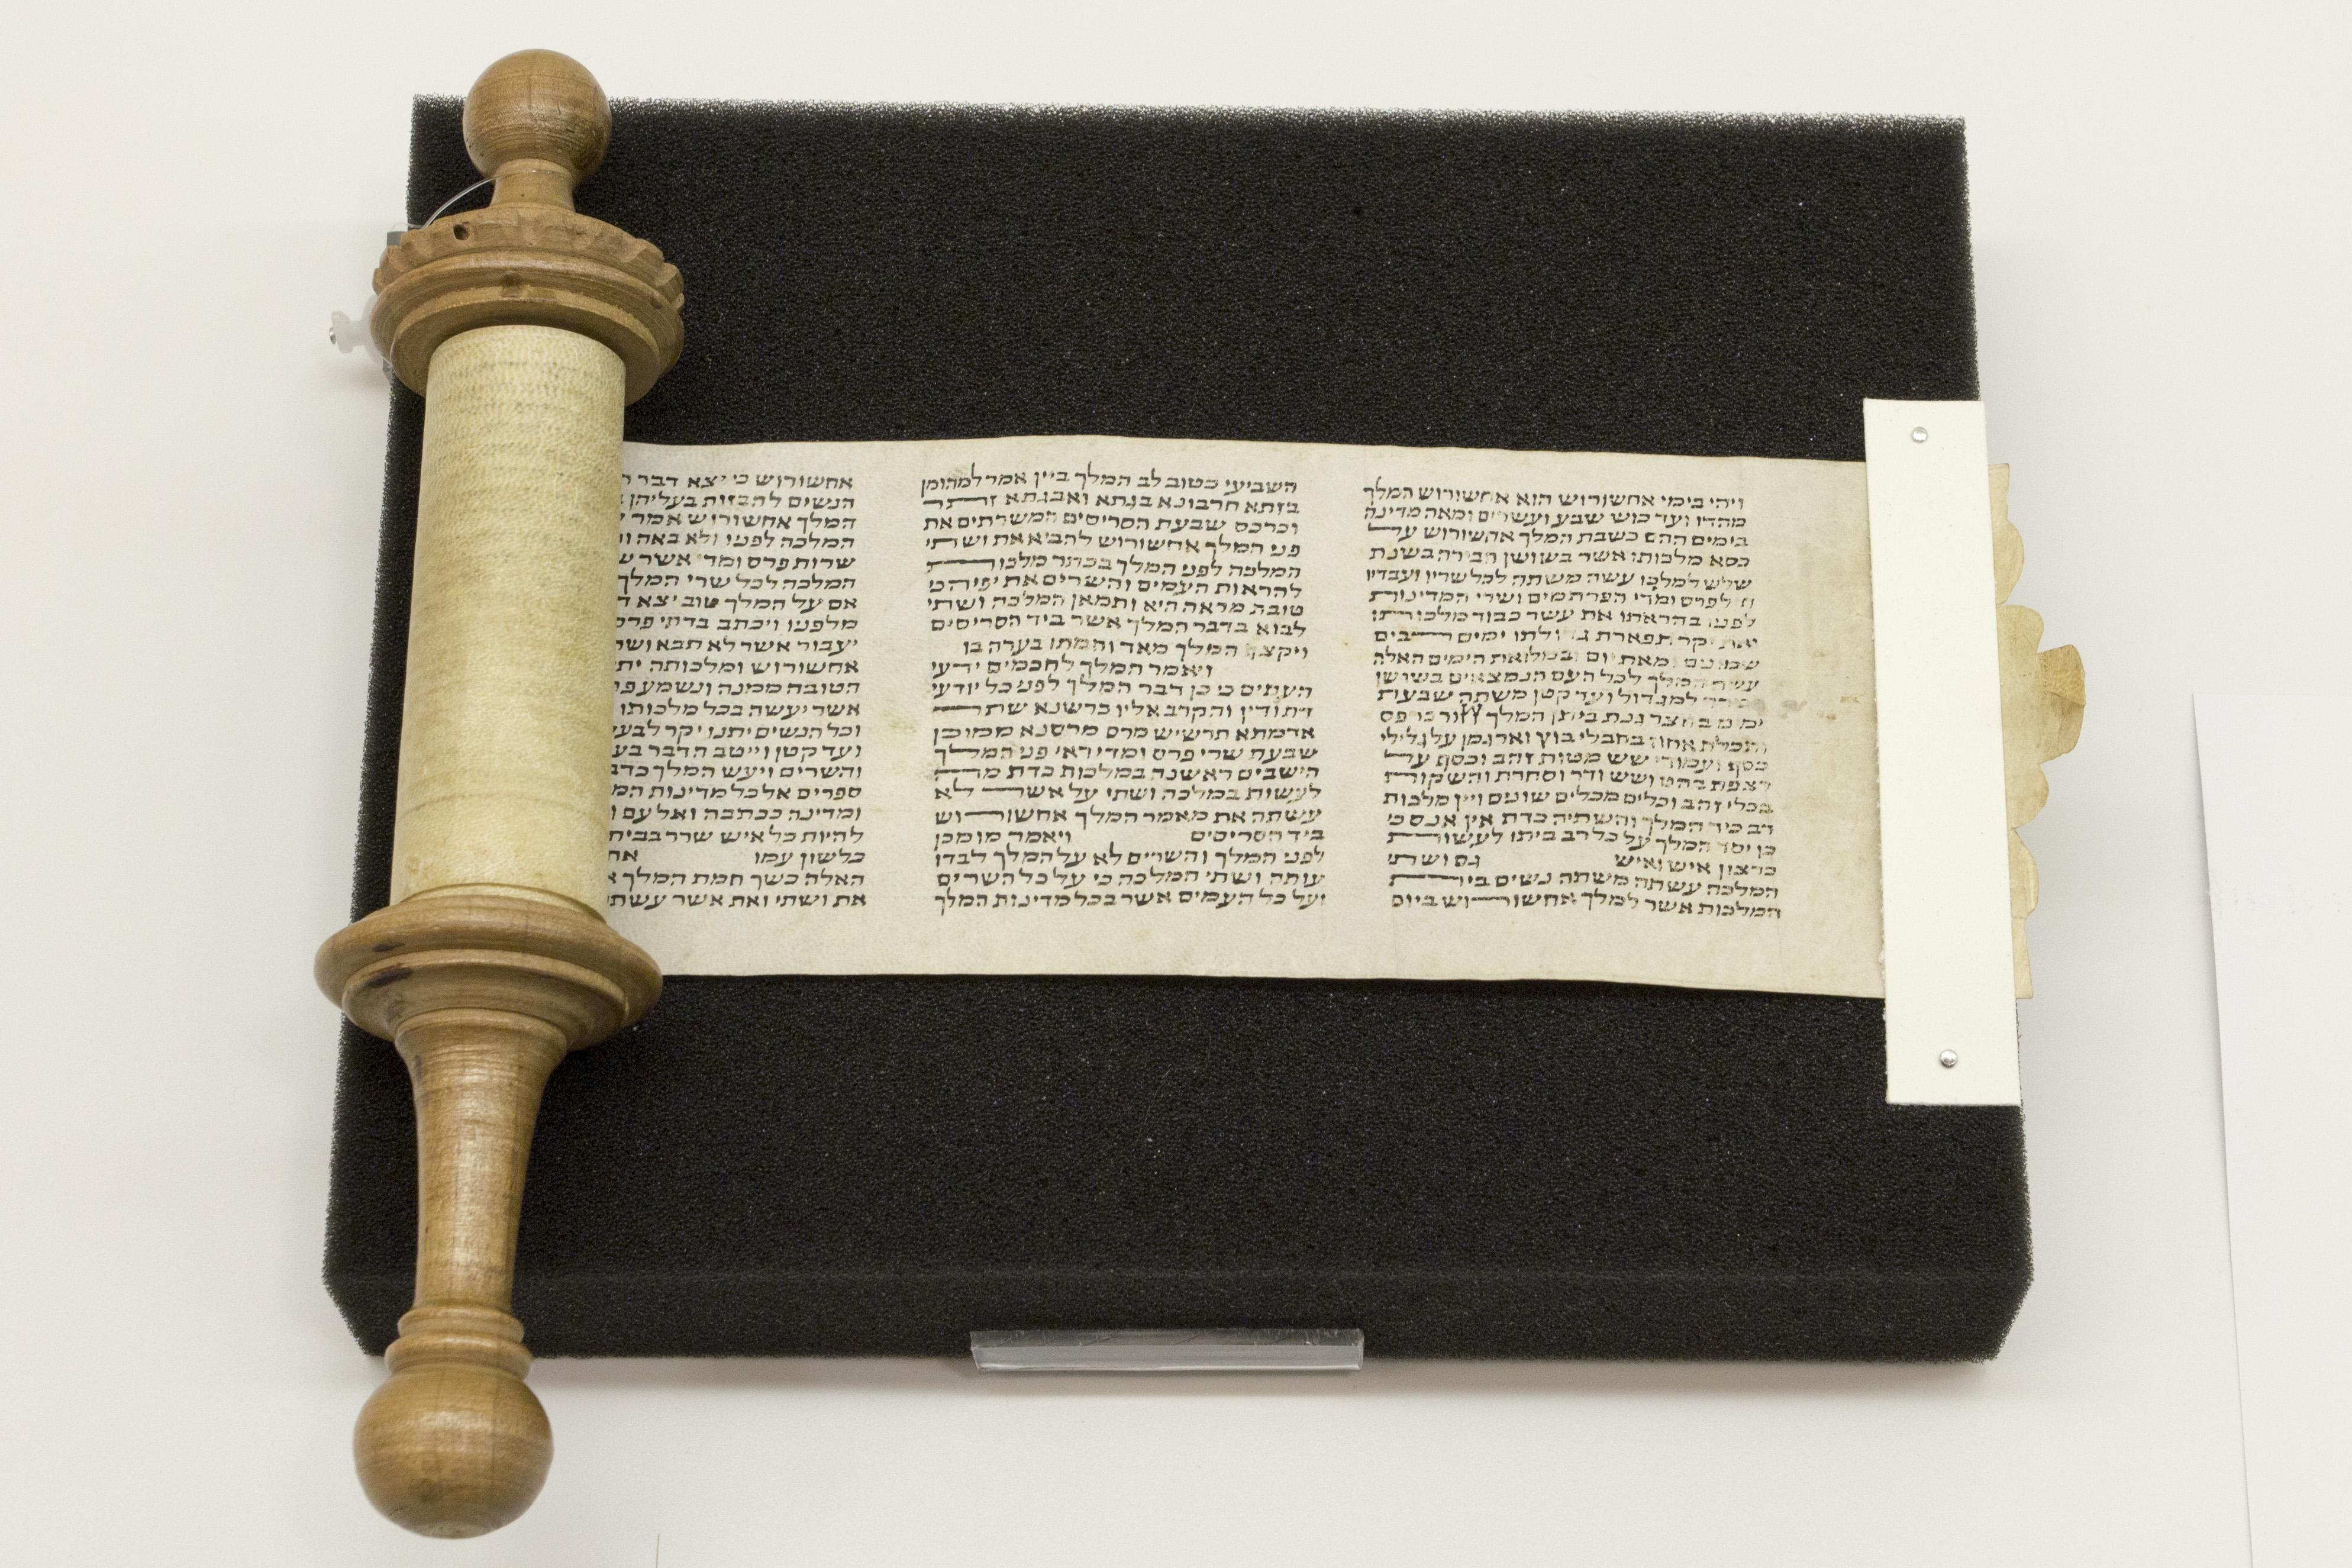 Biblioteca Universitaria di Bologna, Ebraici; ms. 2949